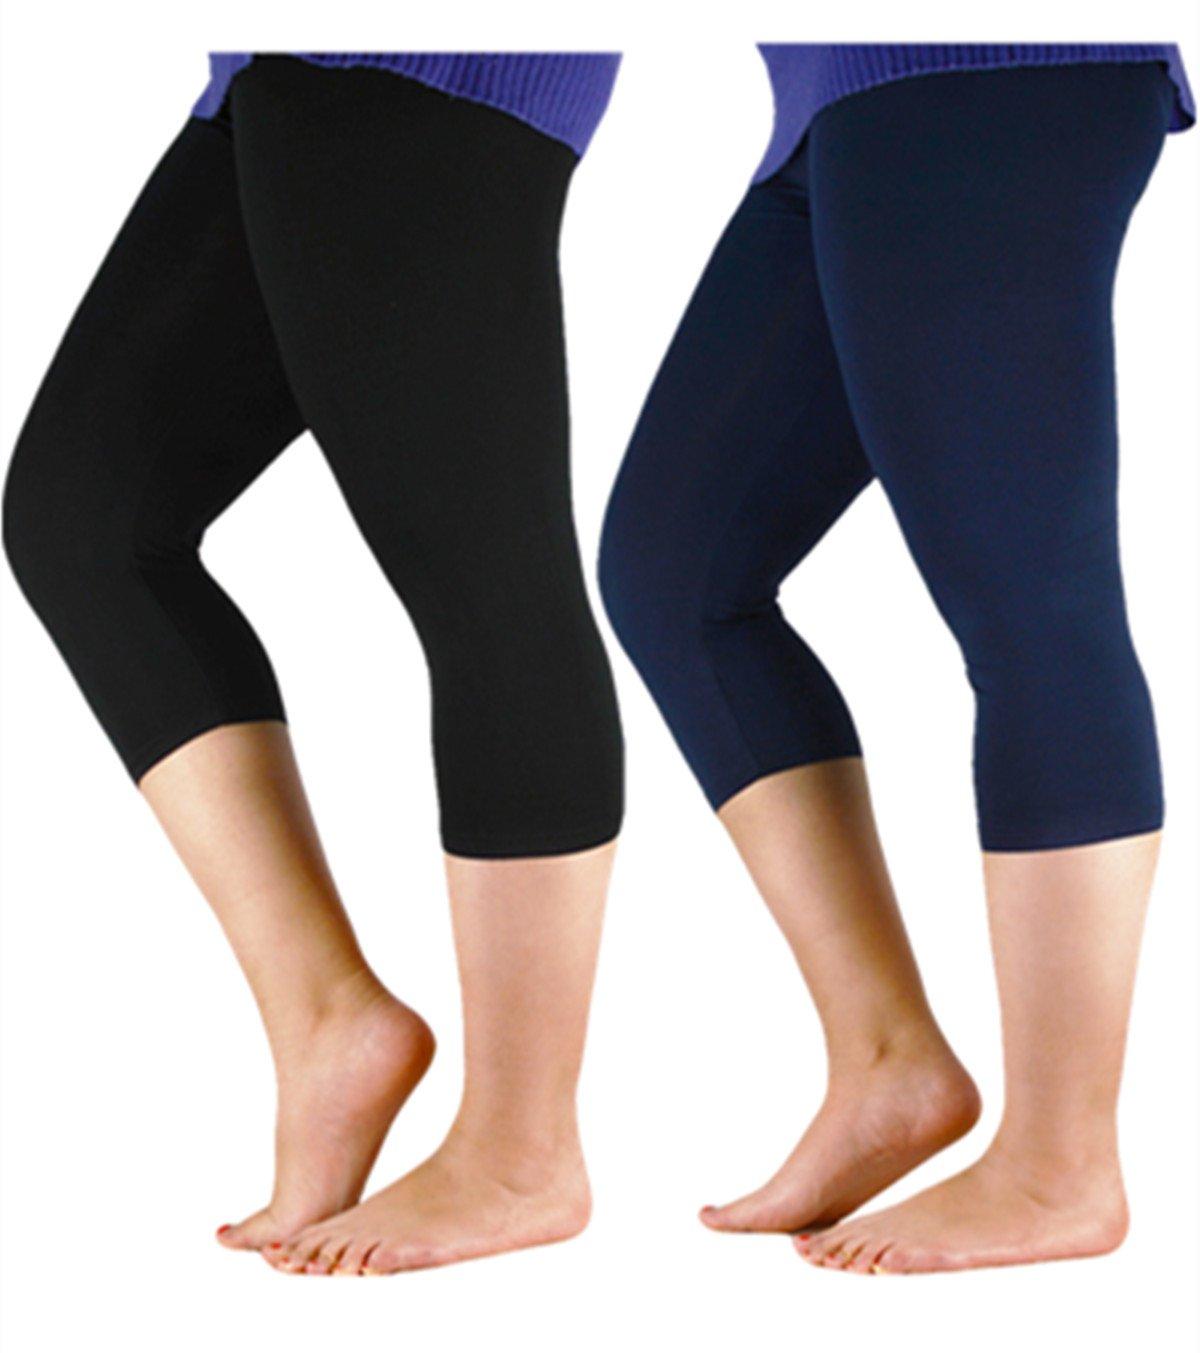 Premium Soft Light Comfy Fit Bamboo Capri Pants Under Dress Leggings for Women Regular and Plus Size 2 Pairs Black Navy 5XL (US XL Plus-US 2XL Plus)